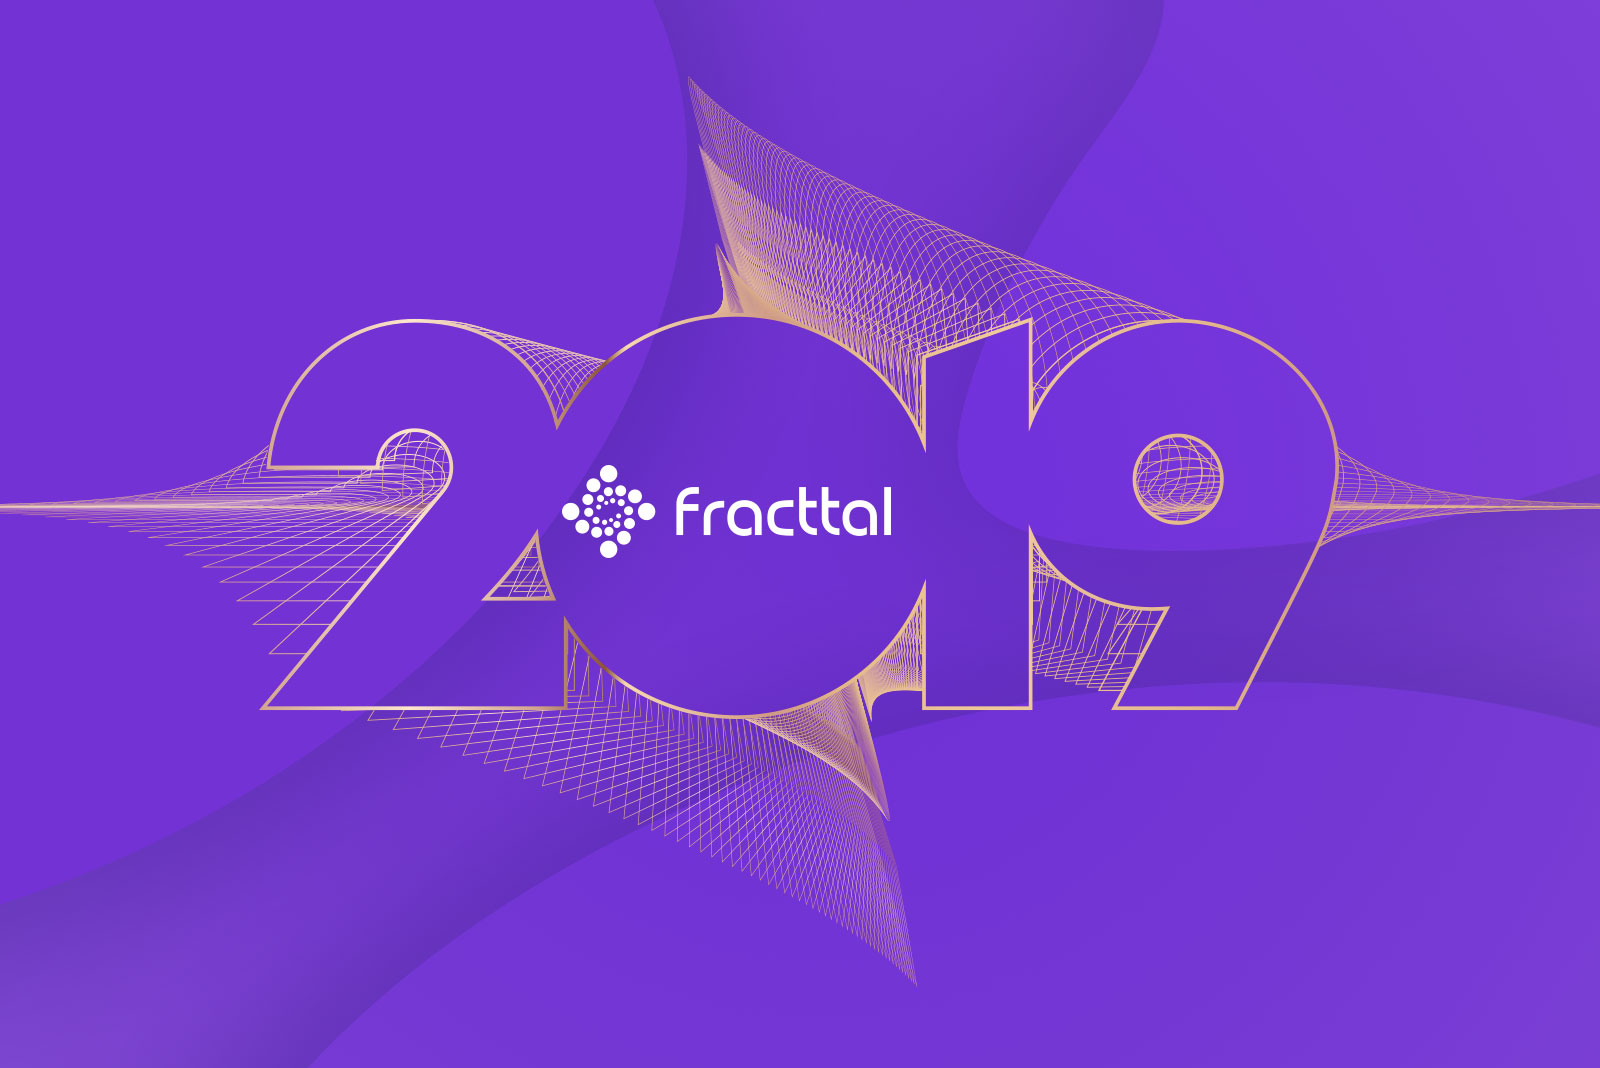 fracttal-2019-app-1